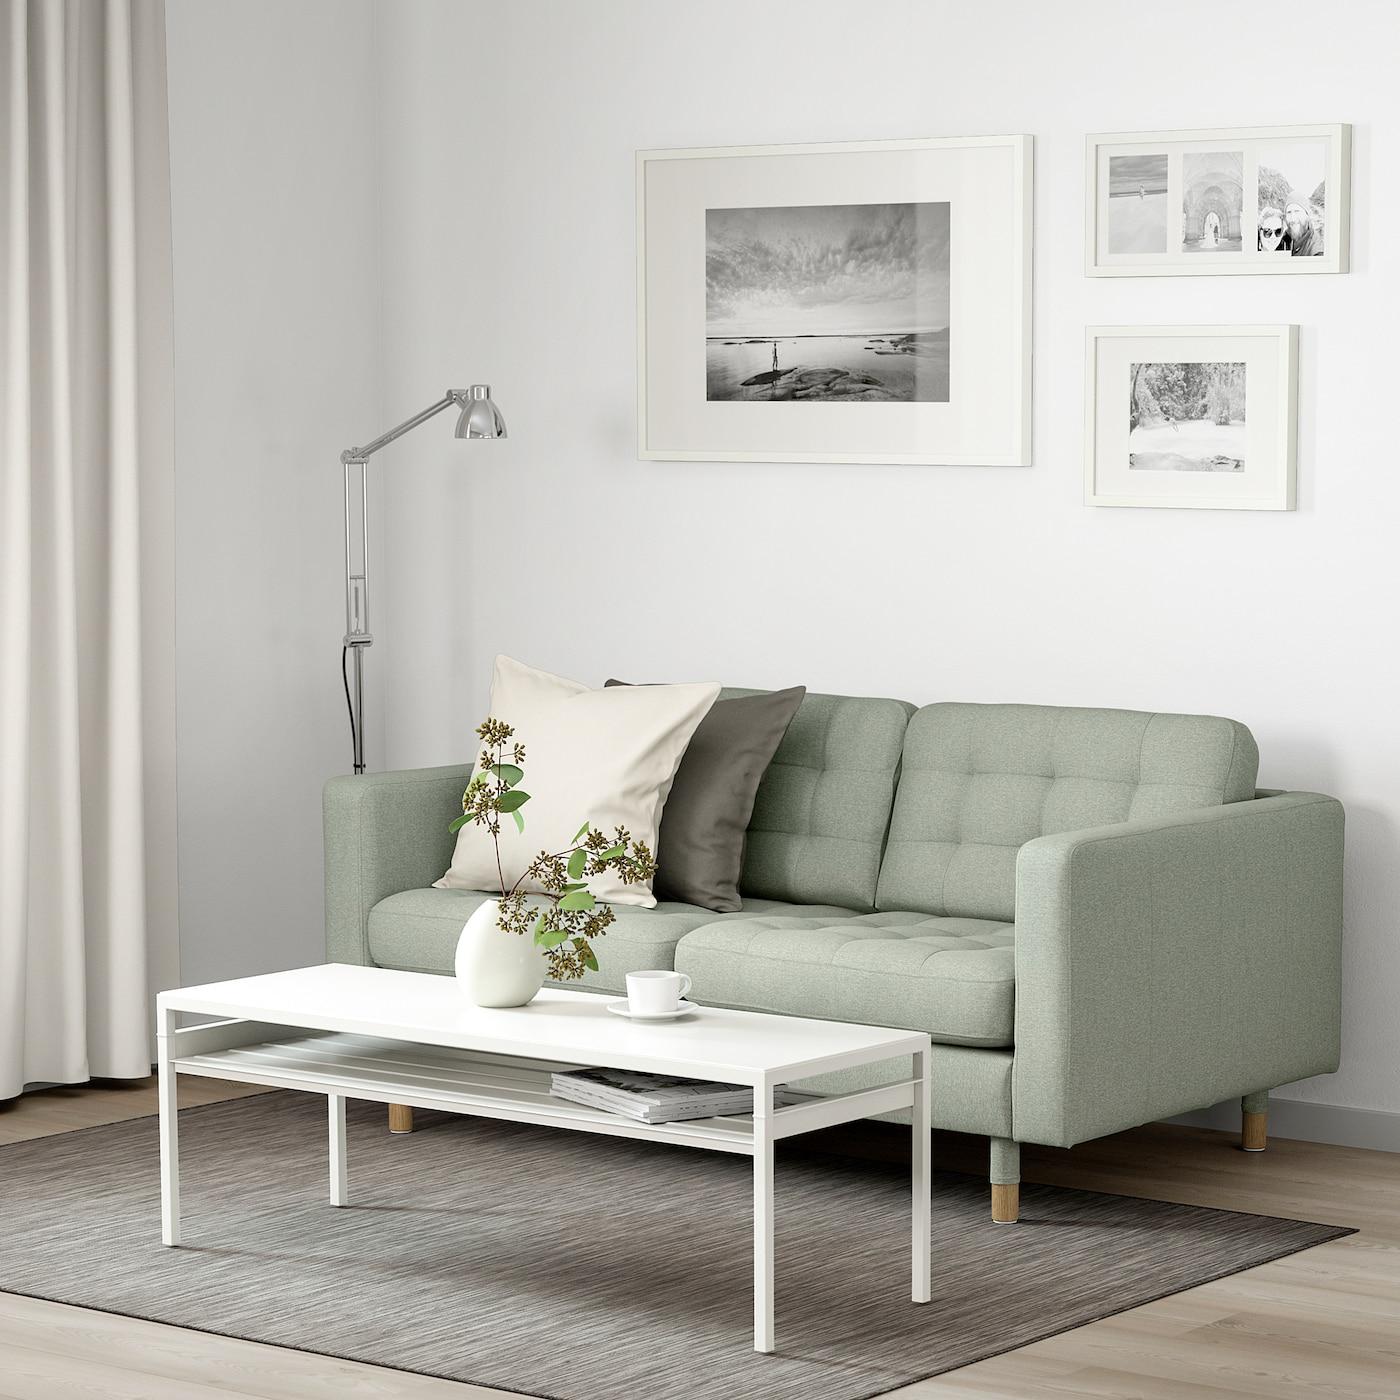 Landskrona 2er Sofa Gunnared Hellgrun Hol Es Dir Hier Ikea Deutschland